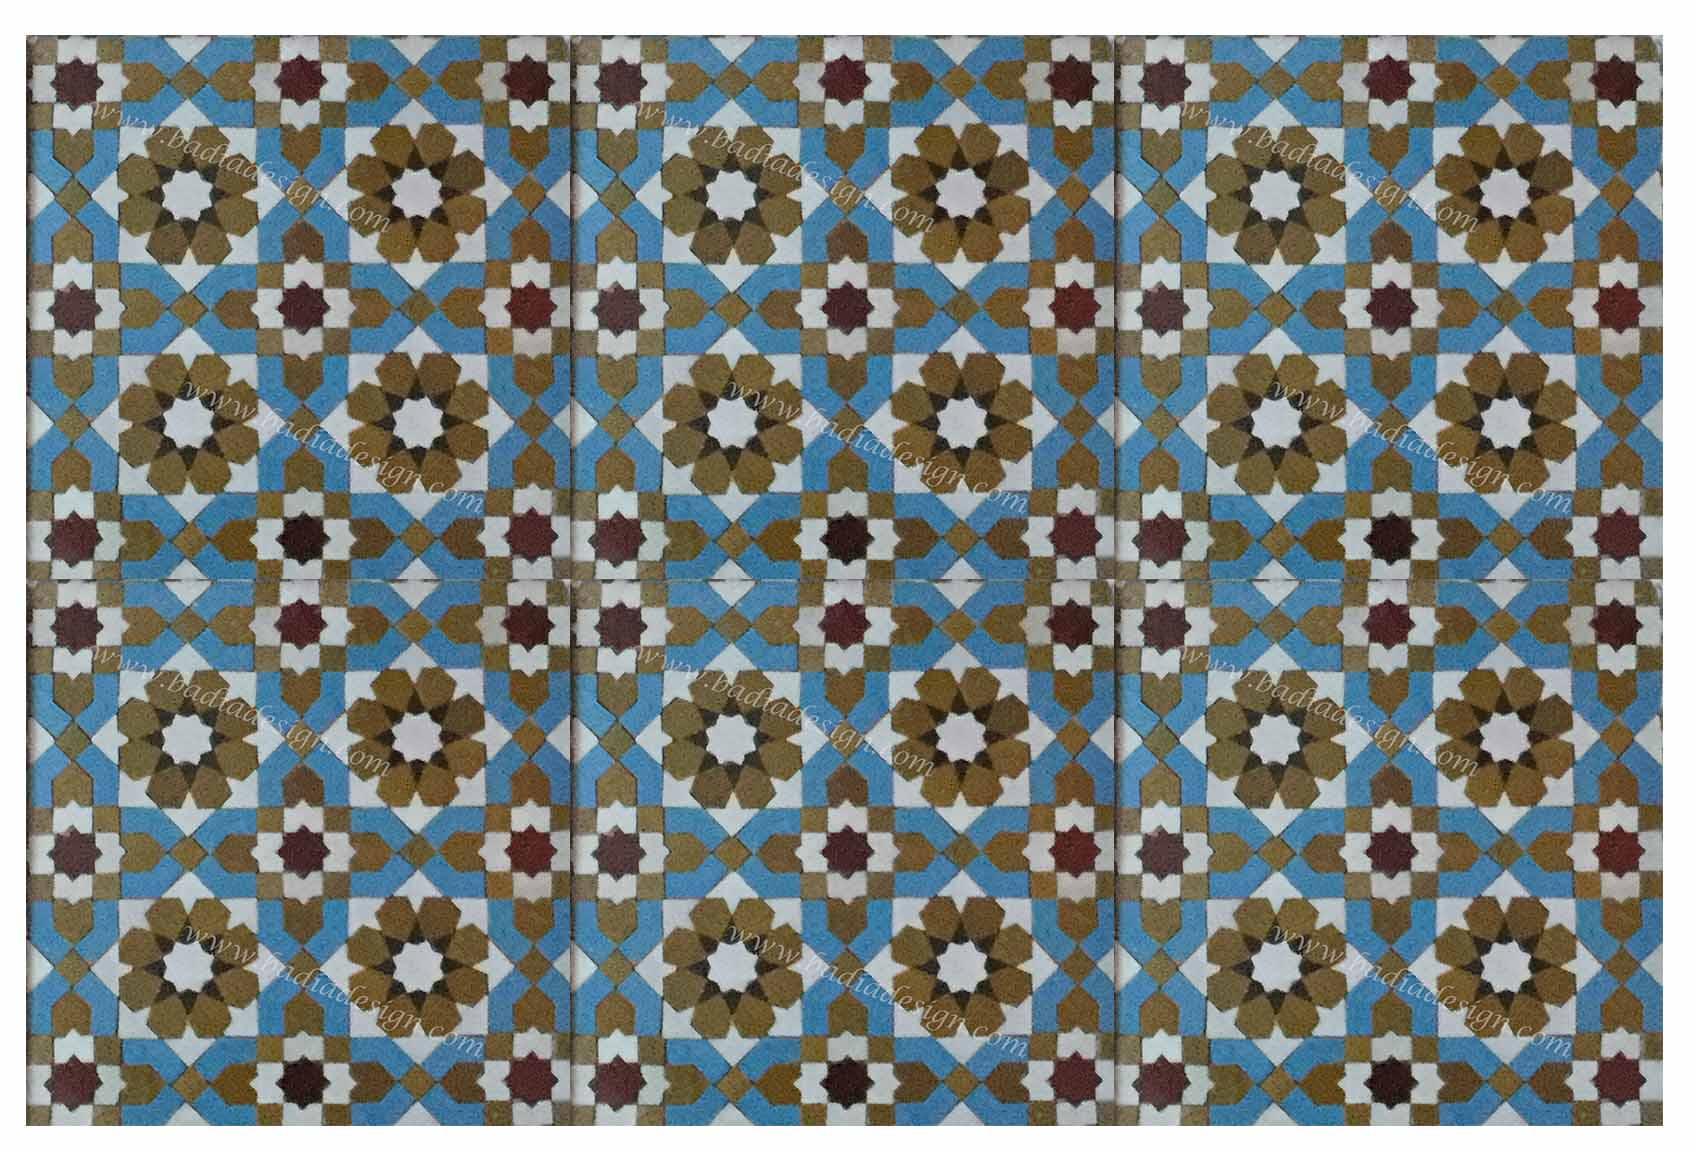 Moroccan Mosaic Floor Tiles from Badia Design Inc.